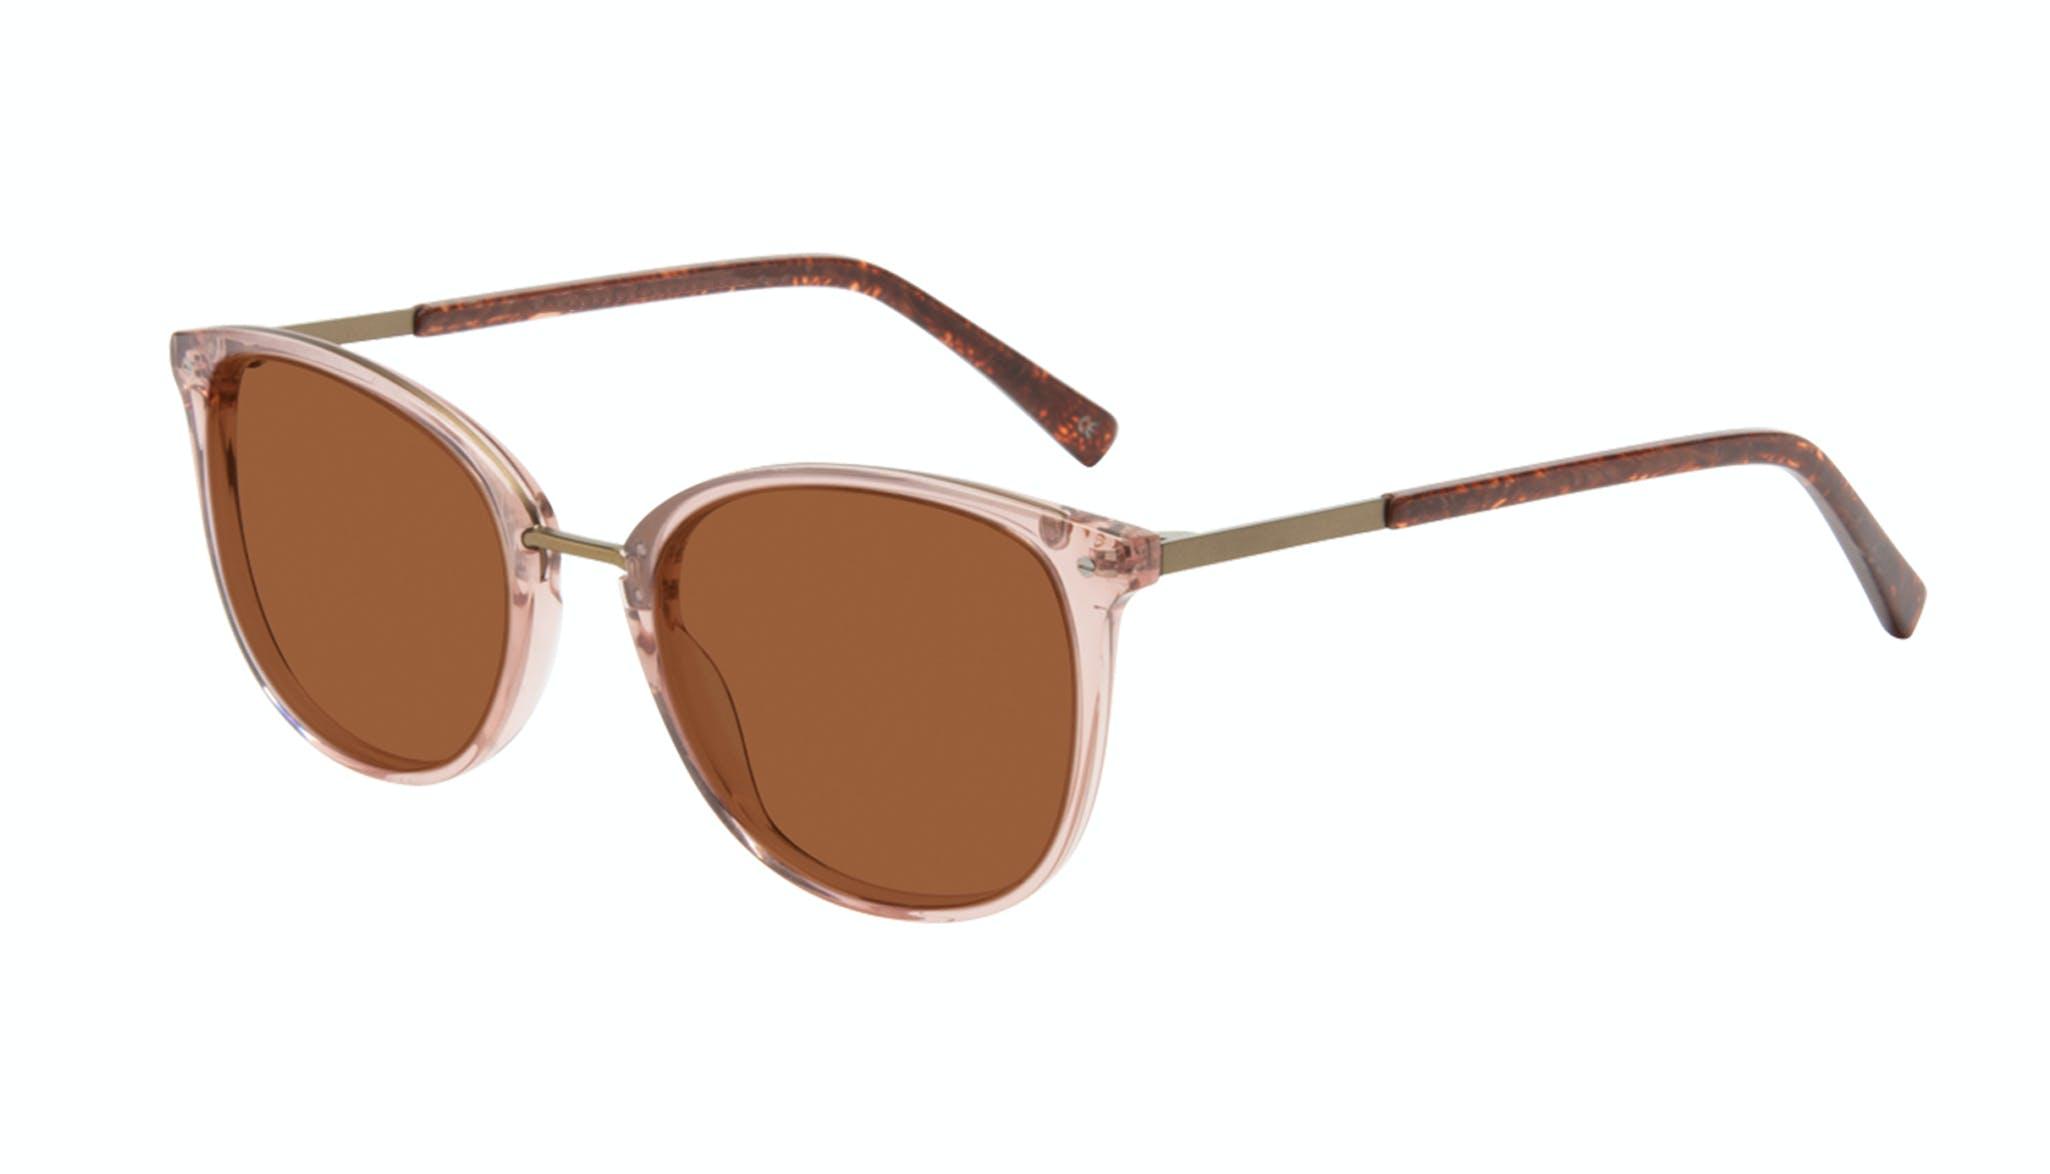 Affordable Fashion Glasses Square Round Sunglasses Women Bella Rose Tilt